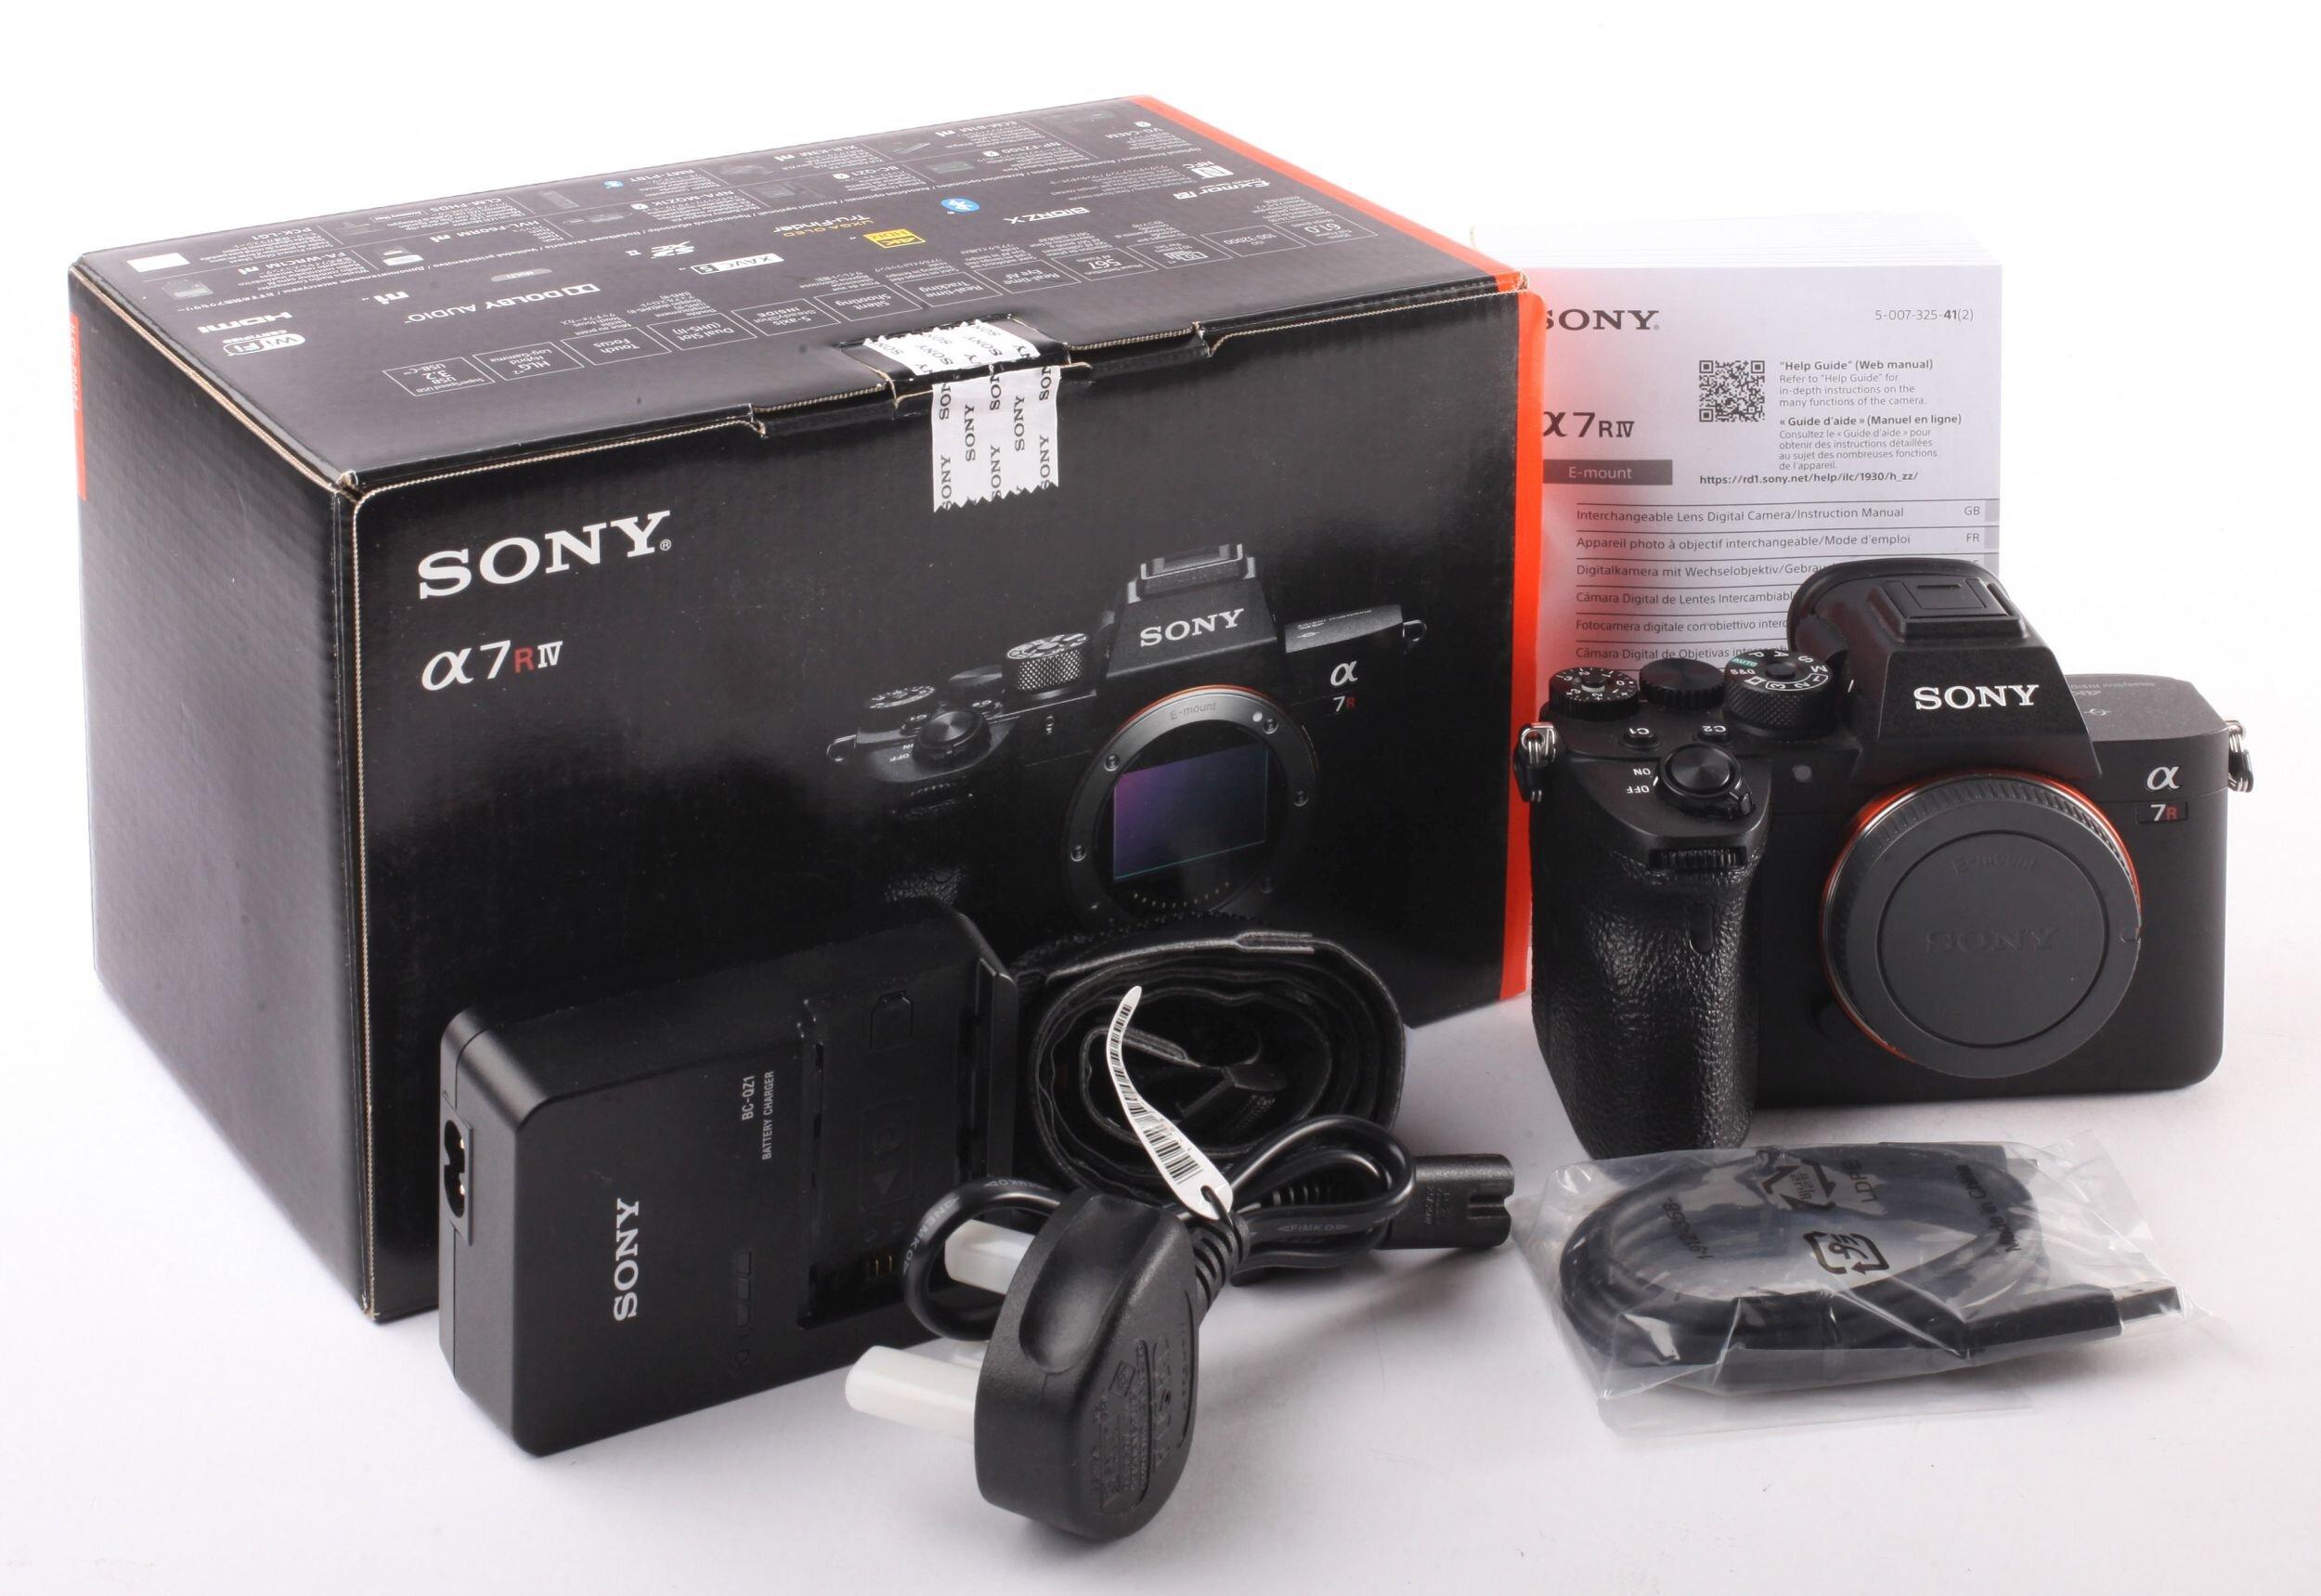 Sony alpha 7R IV Gehäuse 33000 Auslösungen